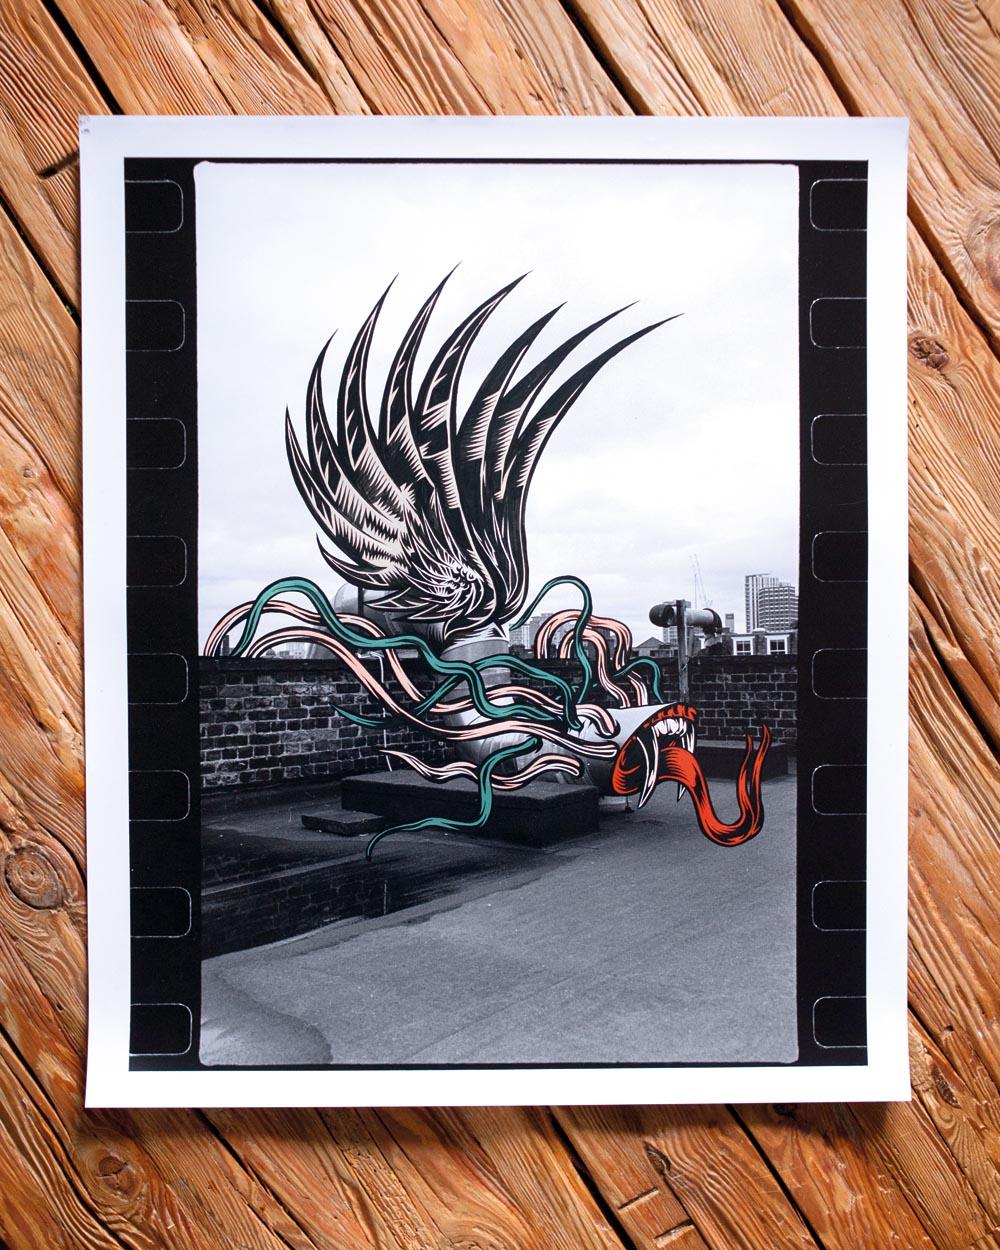 Clashes 04 Maksym Rudnik x Pawel Swanski acrylics on silver gelatin print 50 x 60 cm copy